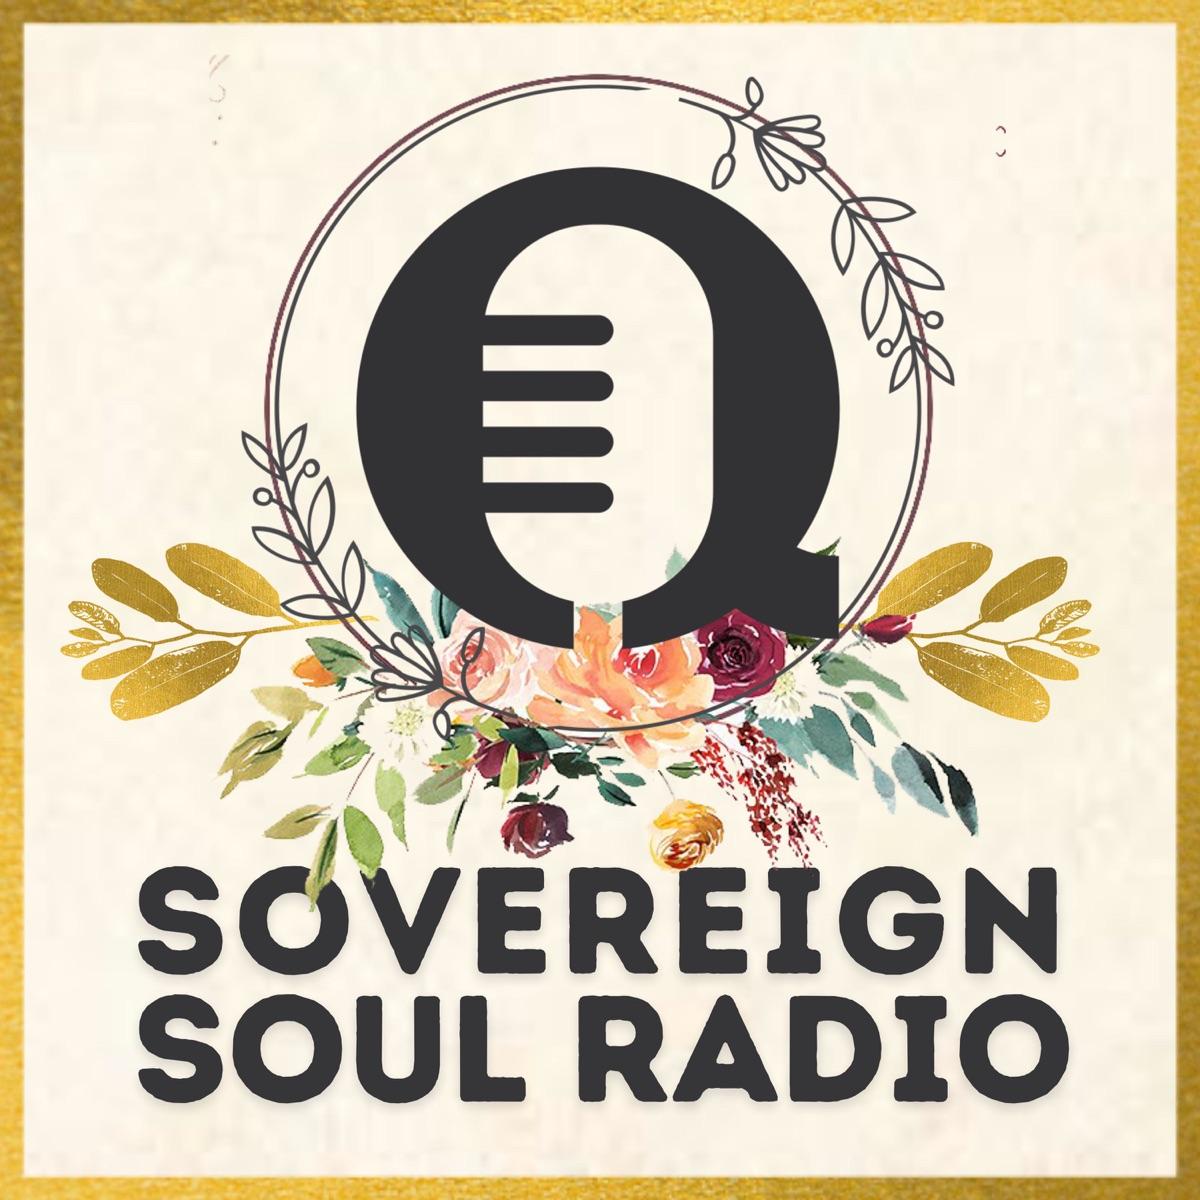 Sovereign Soul Radio